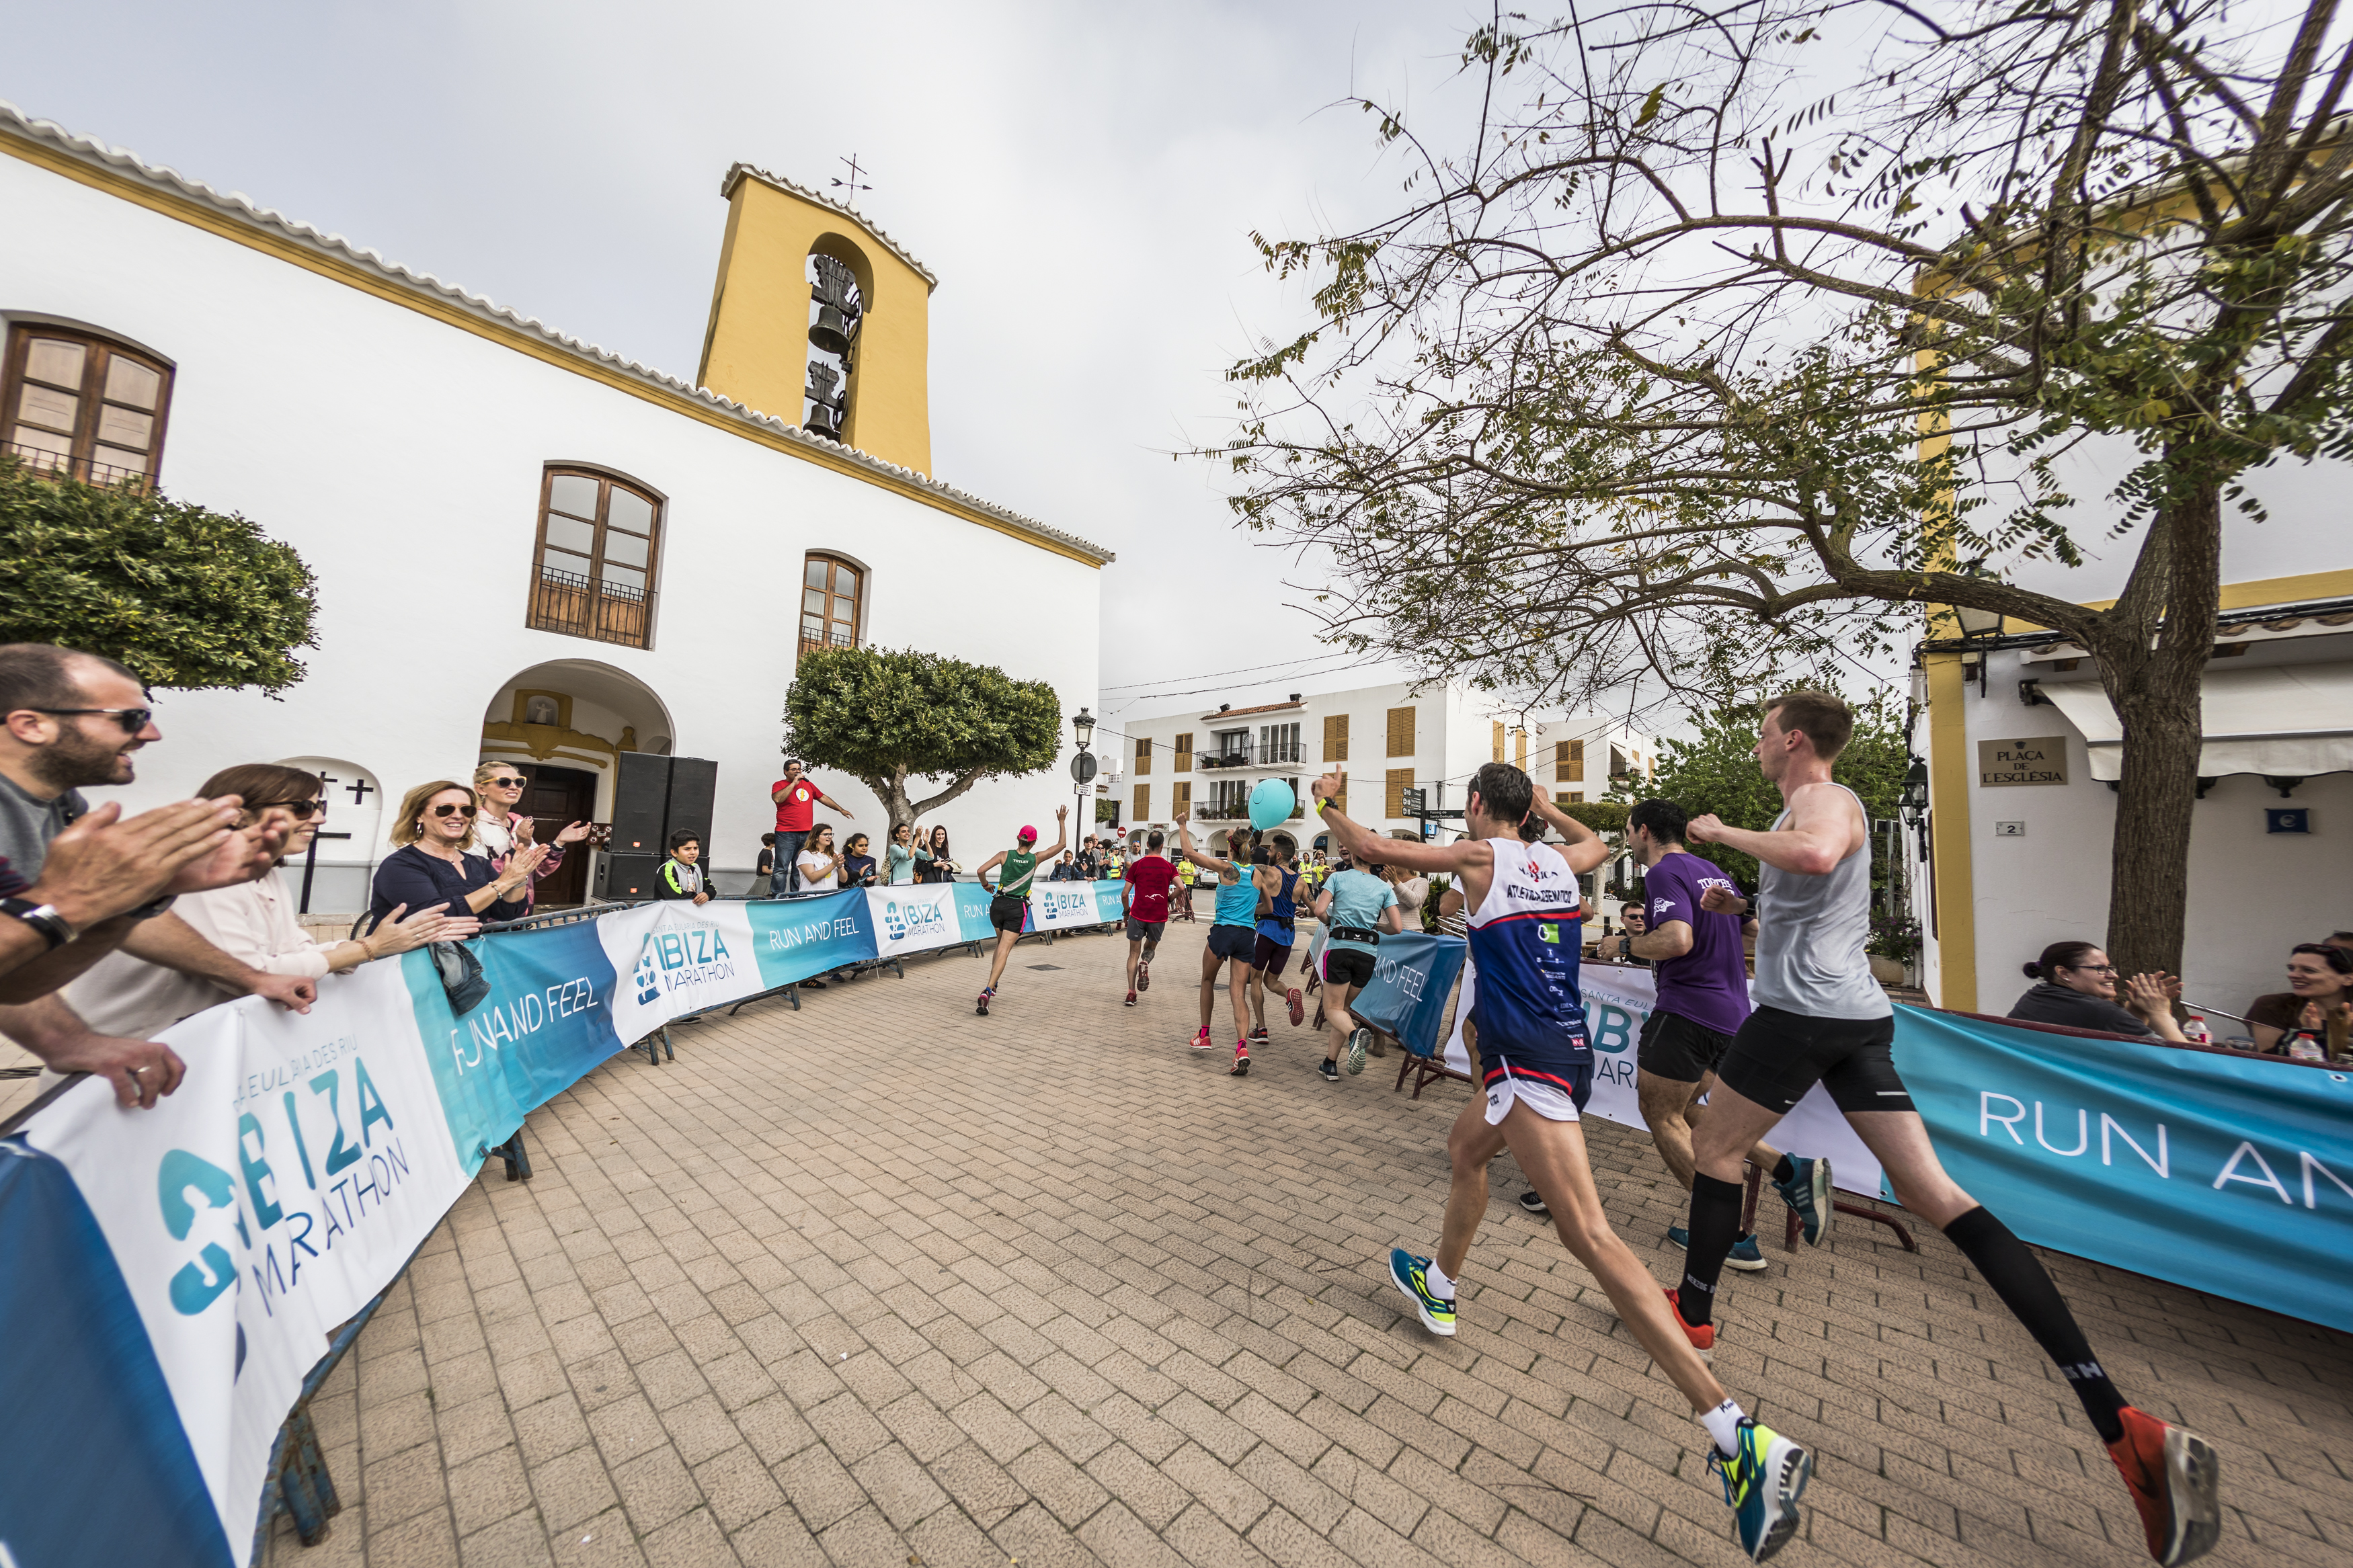 Ibiza Marahton runners